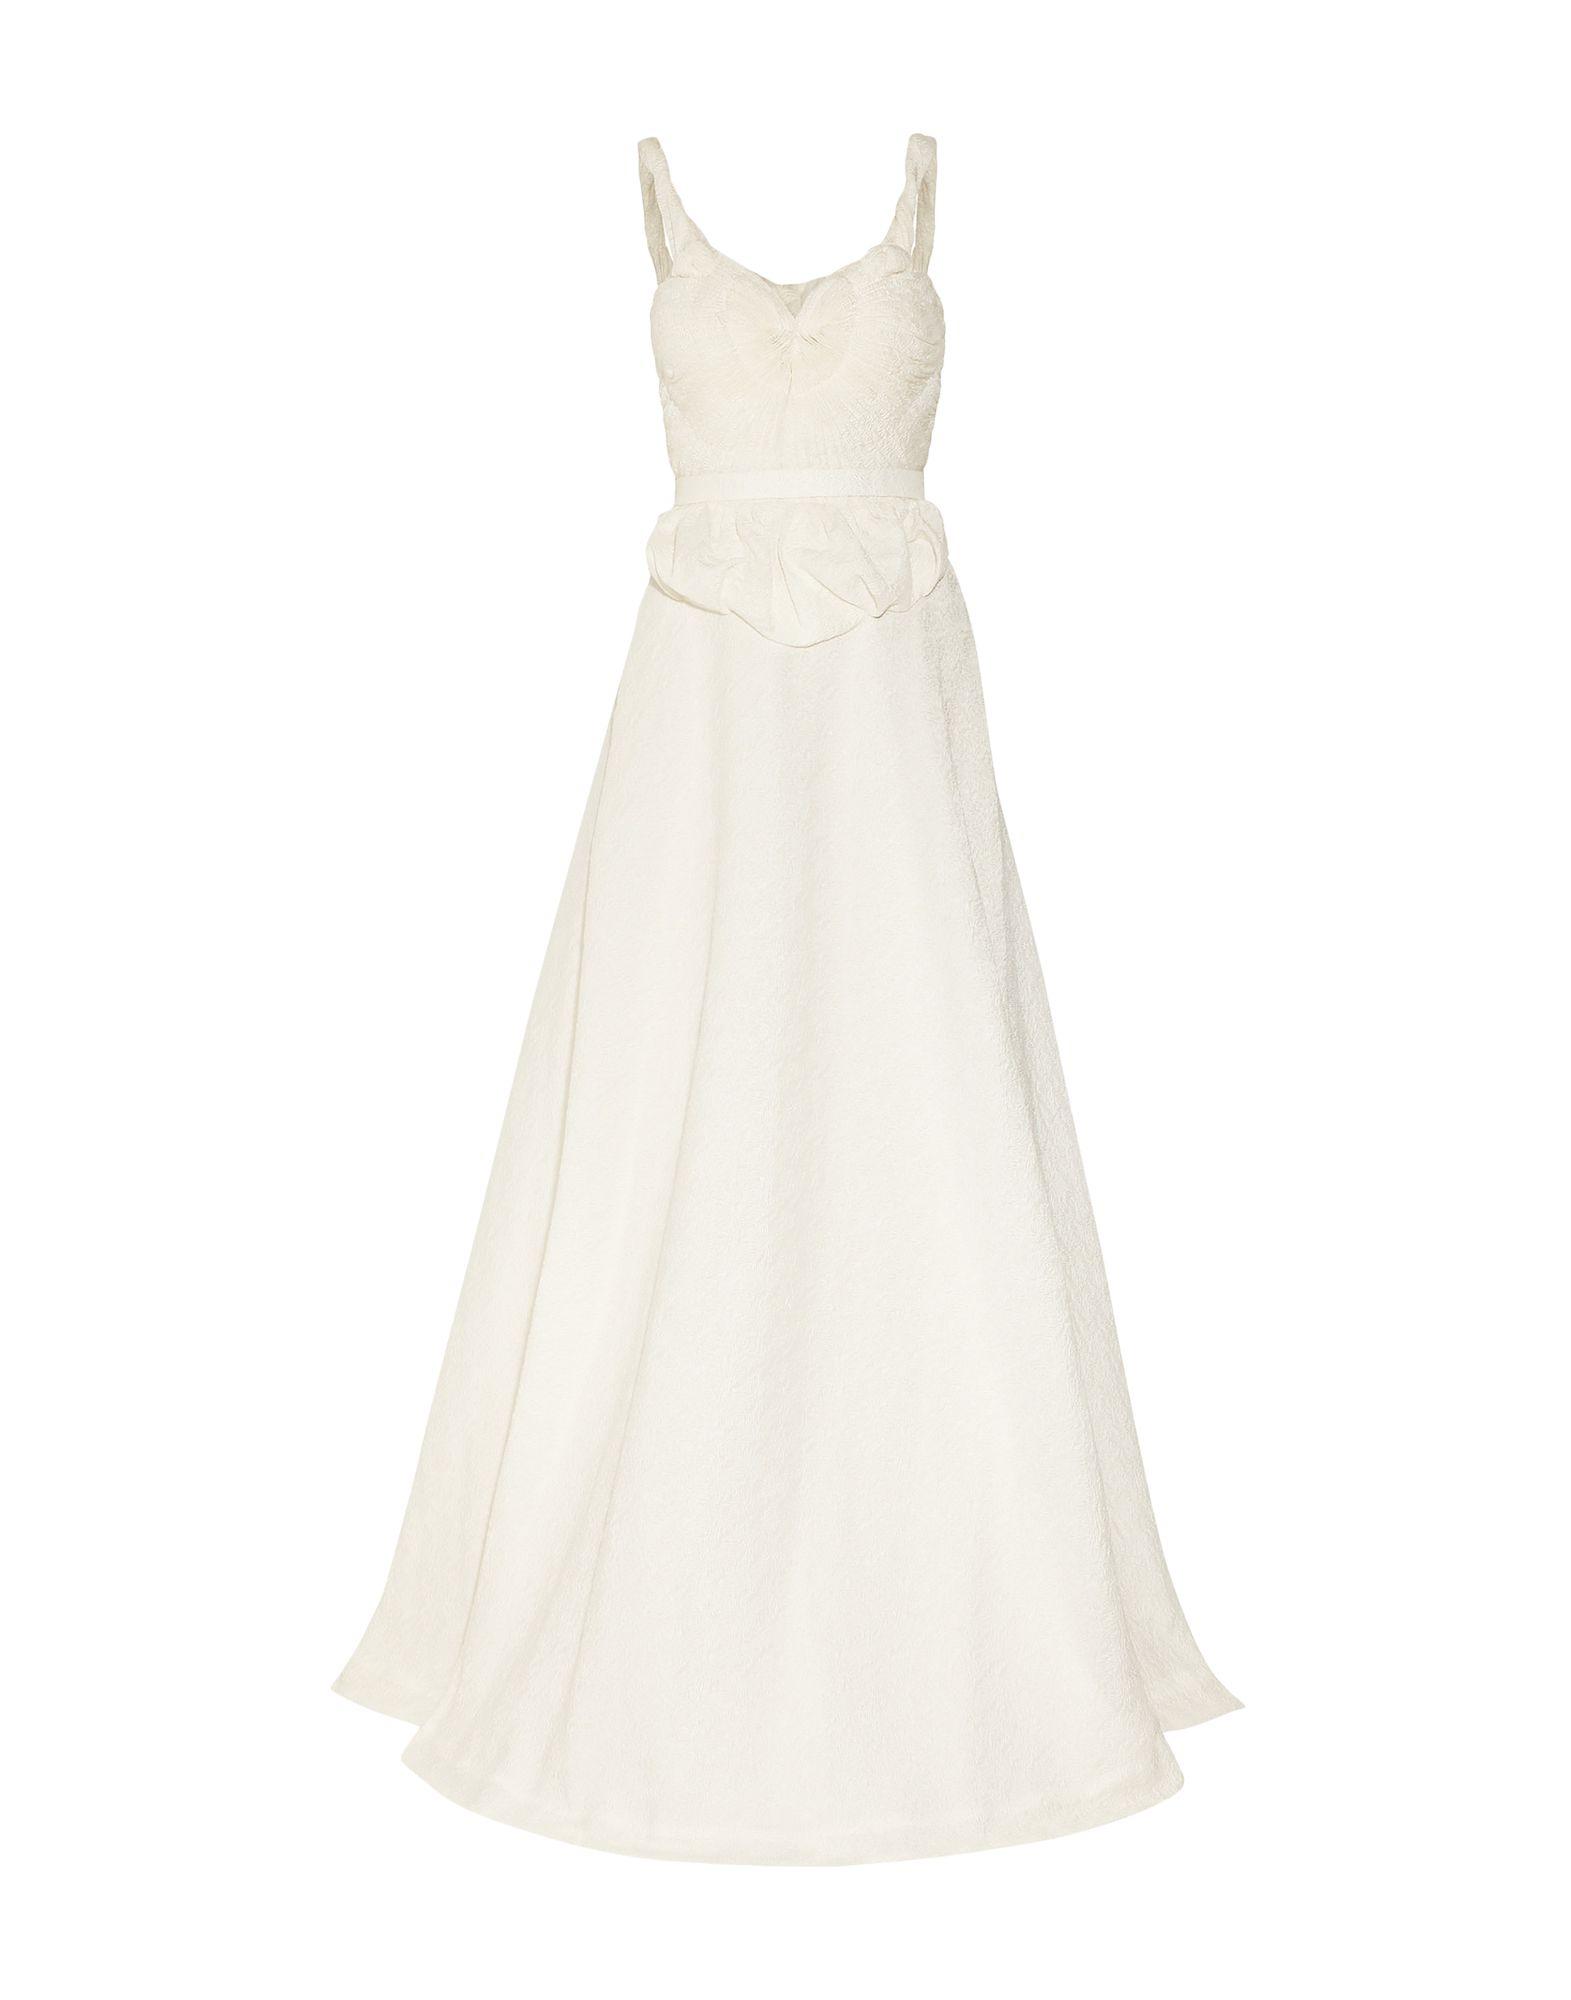 SOPHIA KOKOSALAKI Длинное платье sophia kokosalaki платье до колена